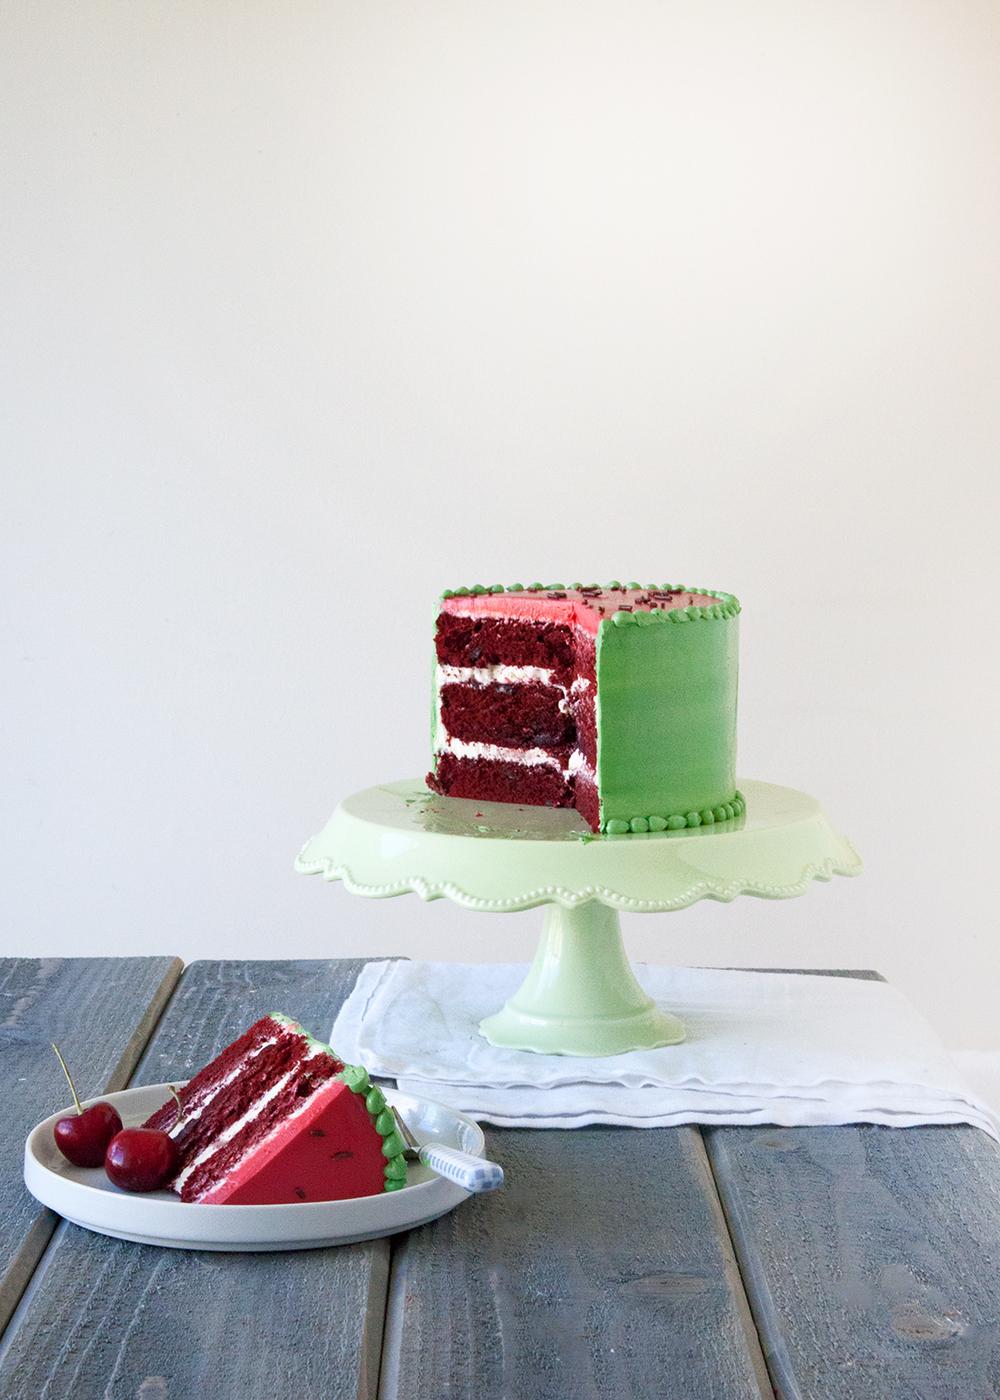 WatermelonCake1